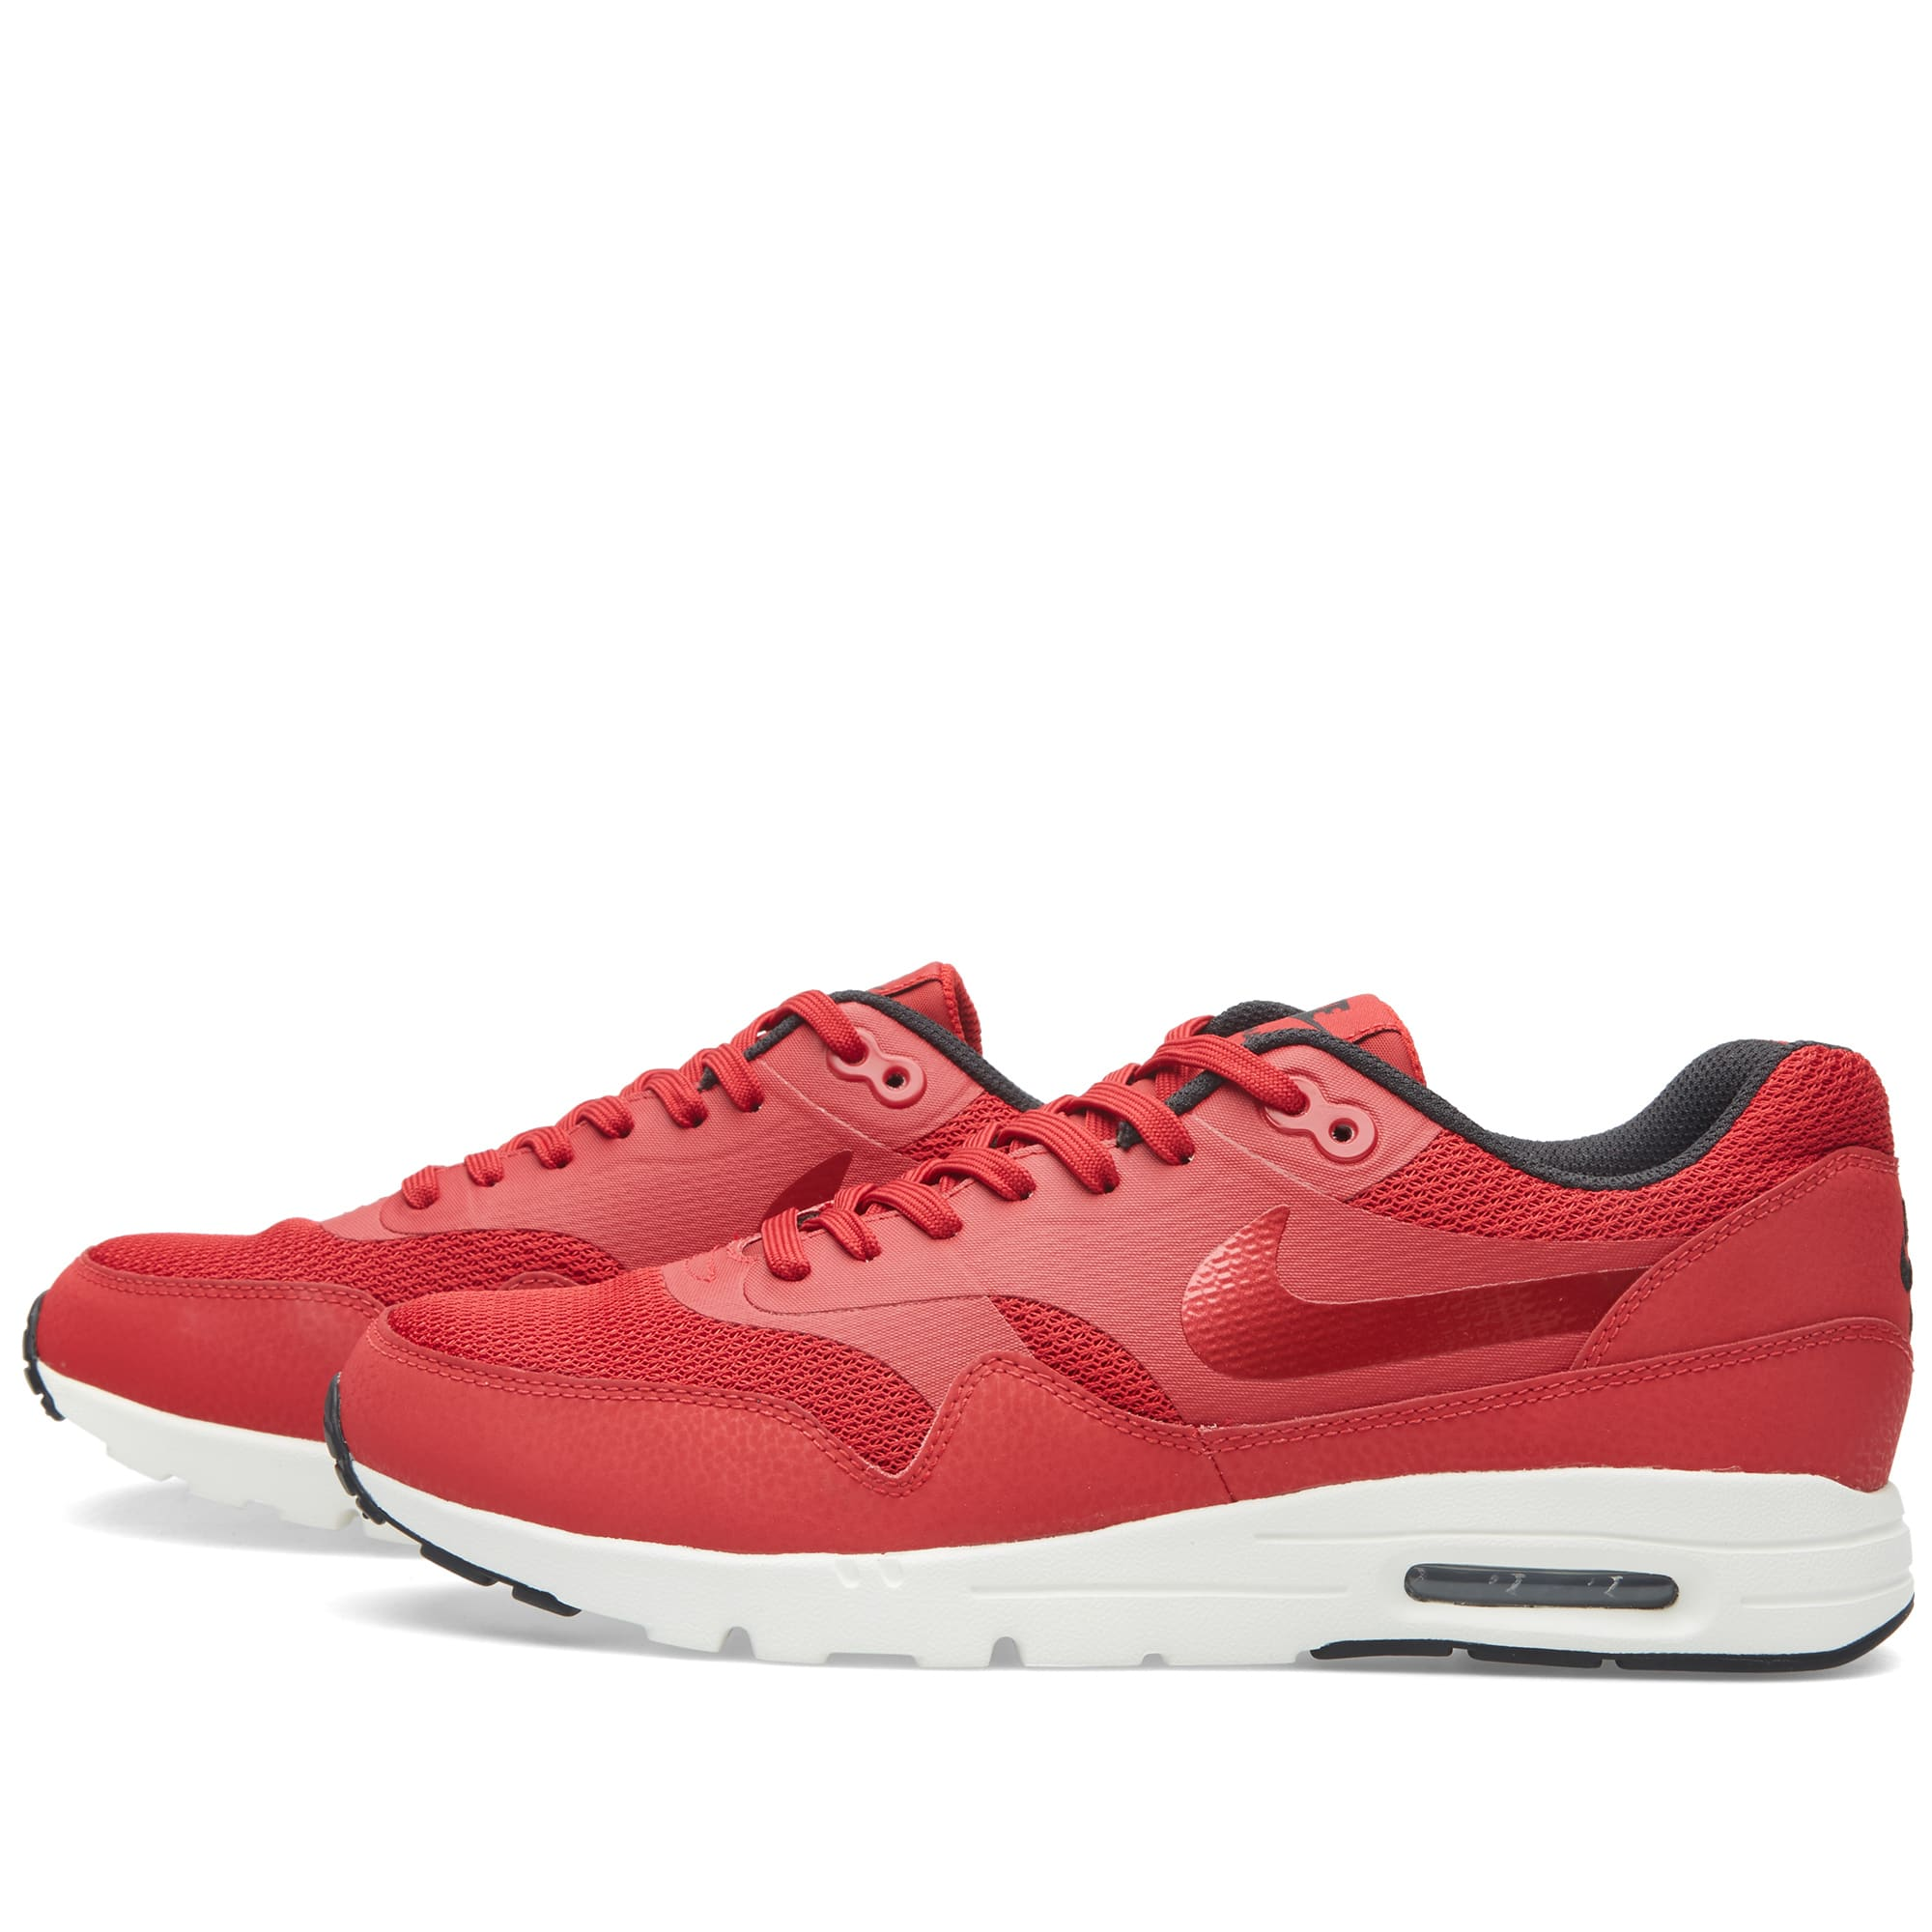 half off 55525 c600f Nike W Air Max 1 Ultra Moire Essential Gym Red, Black   Sail   END.